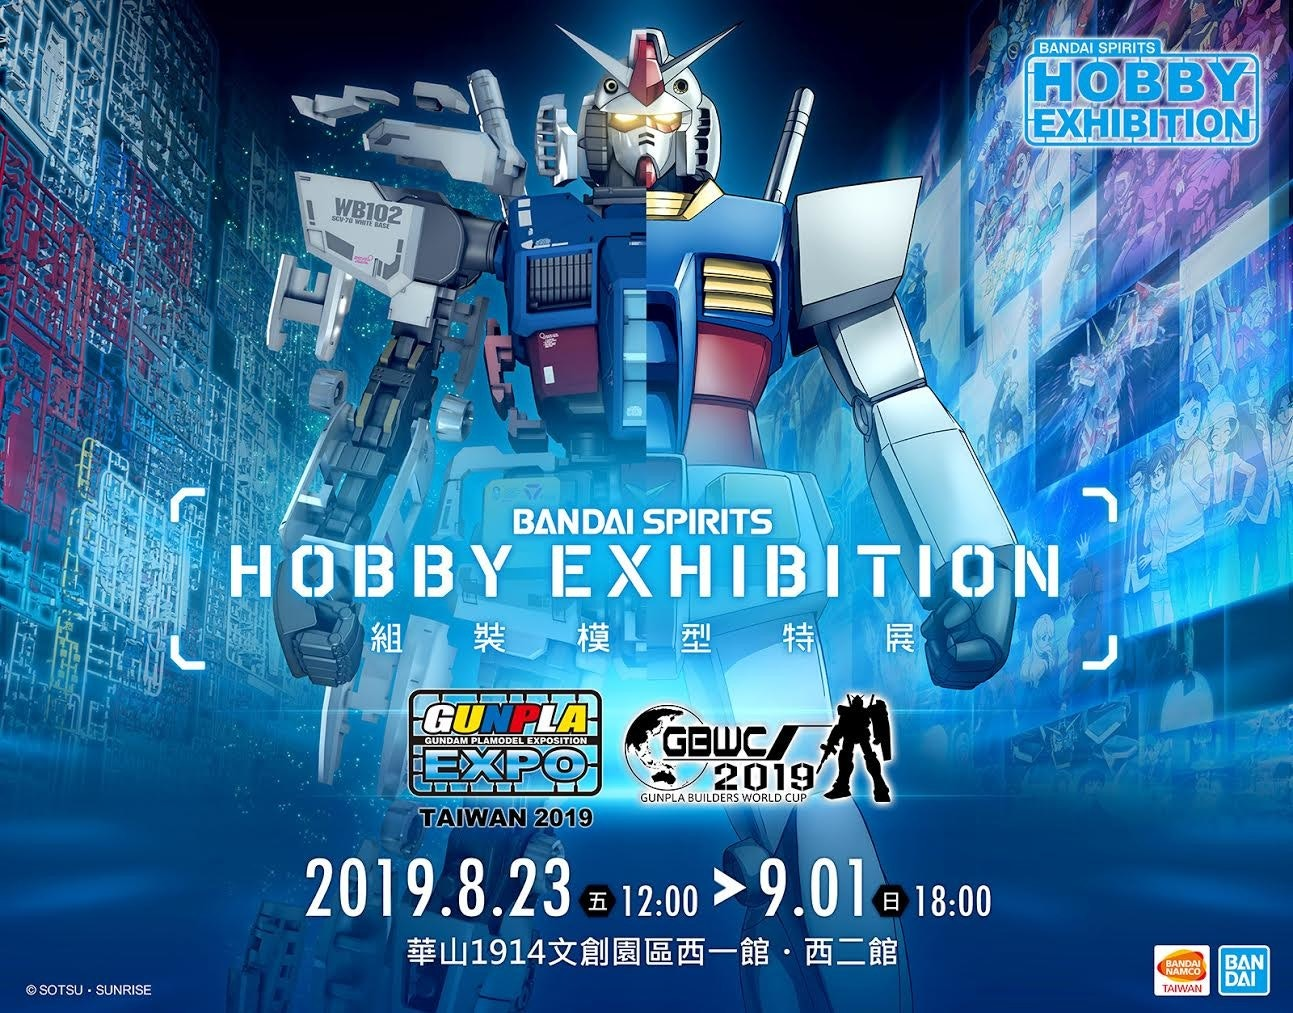 Gunpla Expo Indonesia 2019, Mall of Indonesia, Gundam model, Gundam, RX-0 独角兽高达, 2019, Exhibition, , , Bandai SPIRITS Co, gunpla expo indonesia 2019, Games, Graphic design, Technology, Advertising, Poster, Font, Pc game, World, Fictional character, Action figure